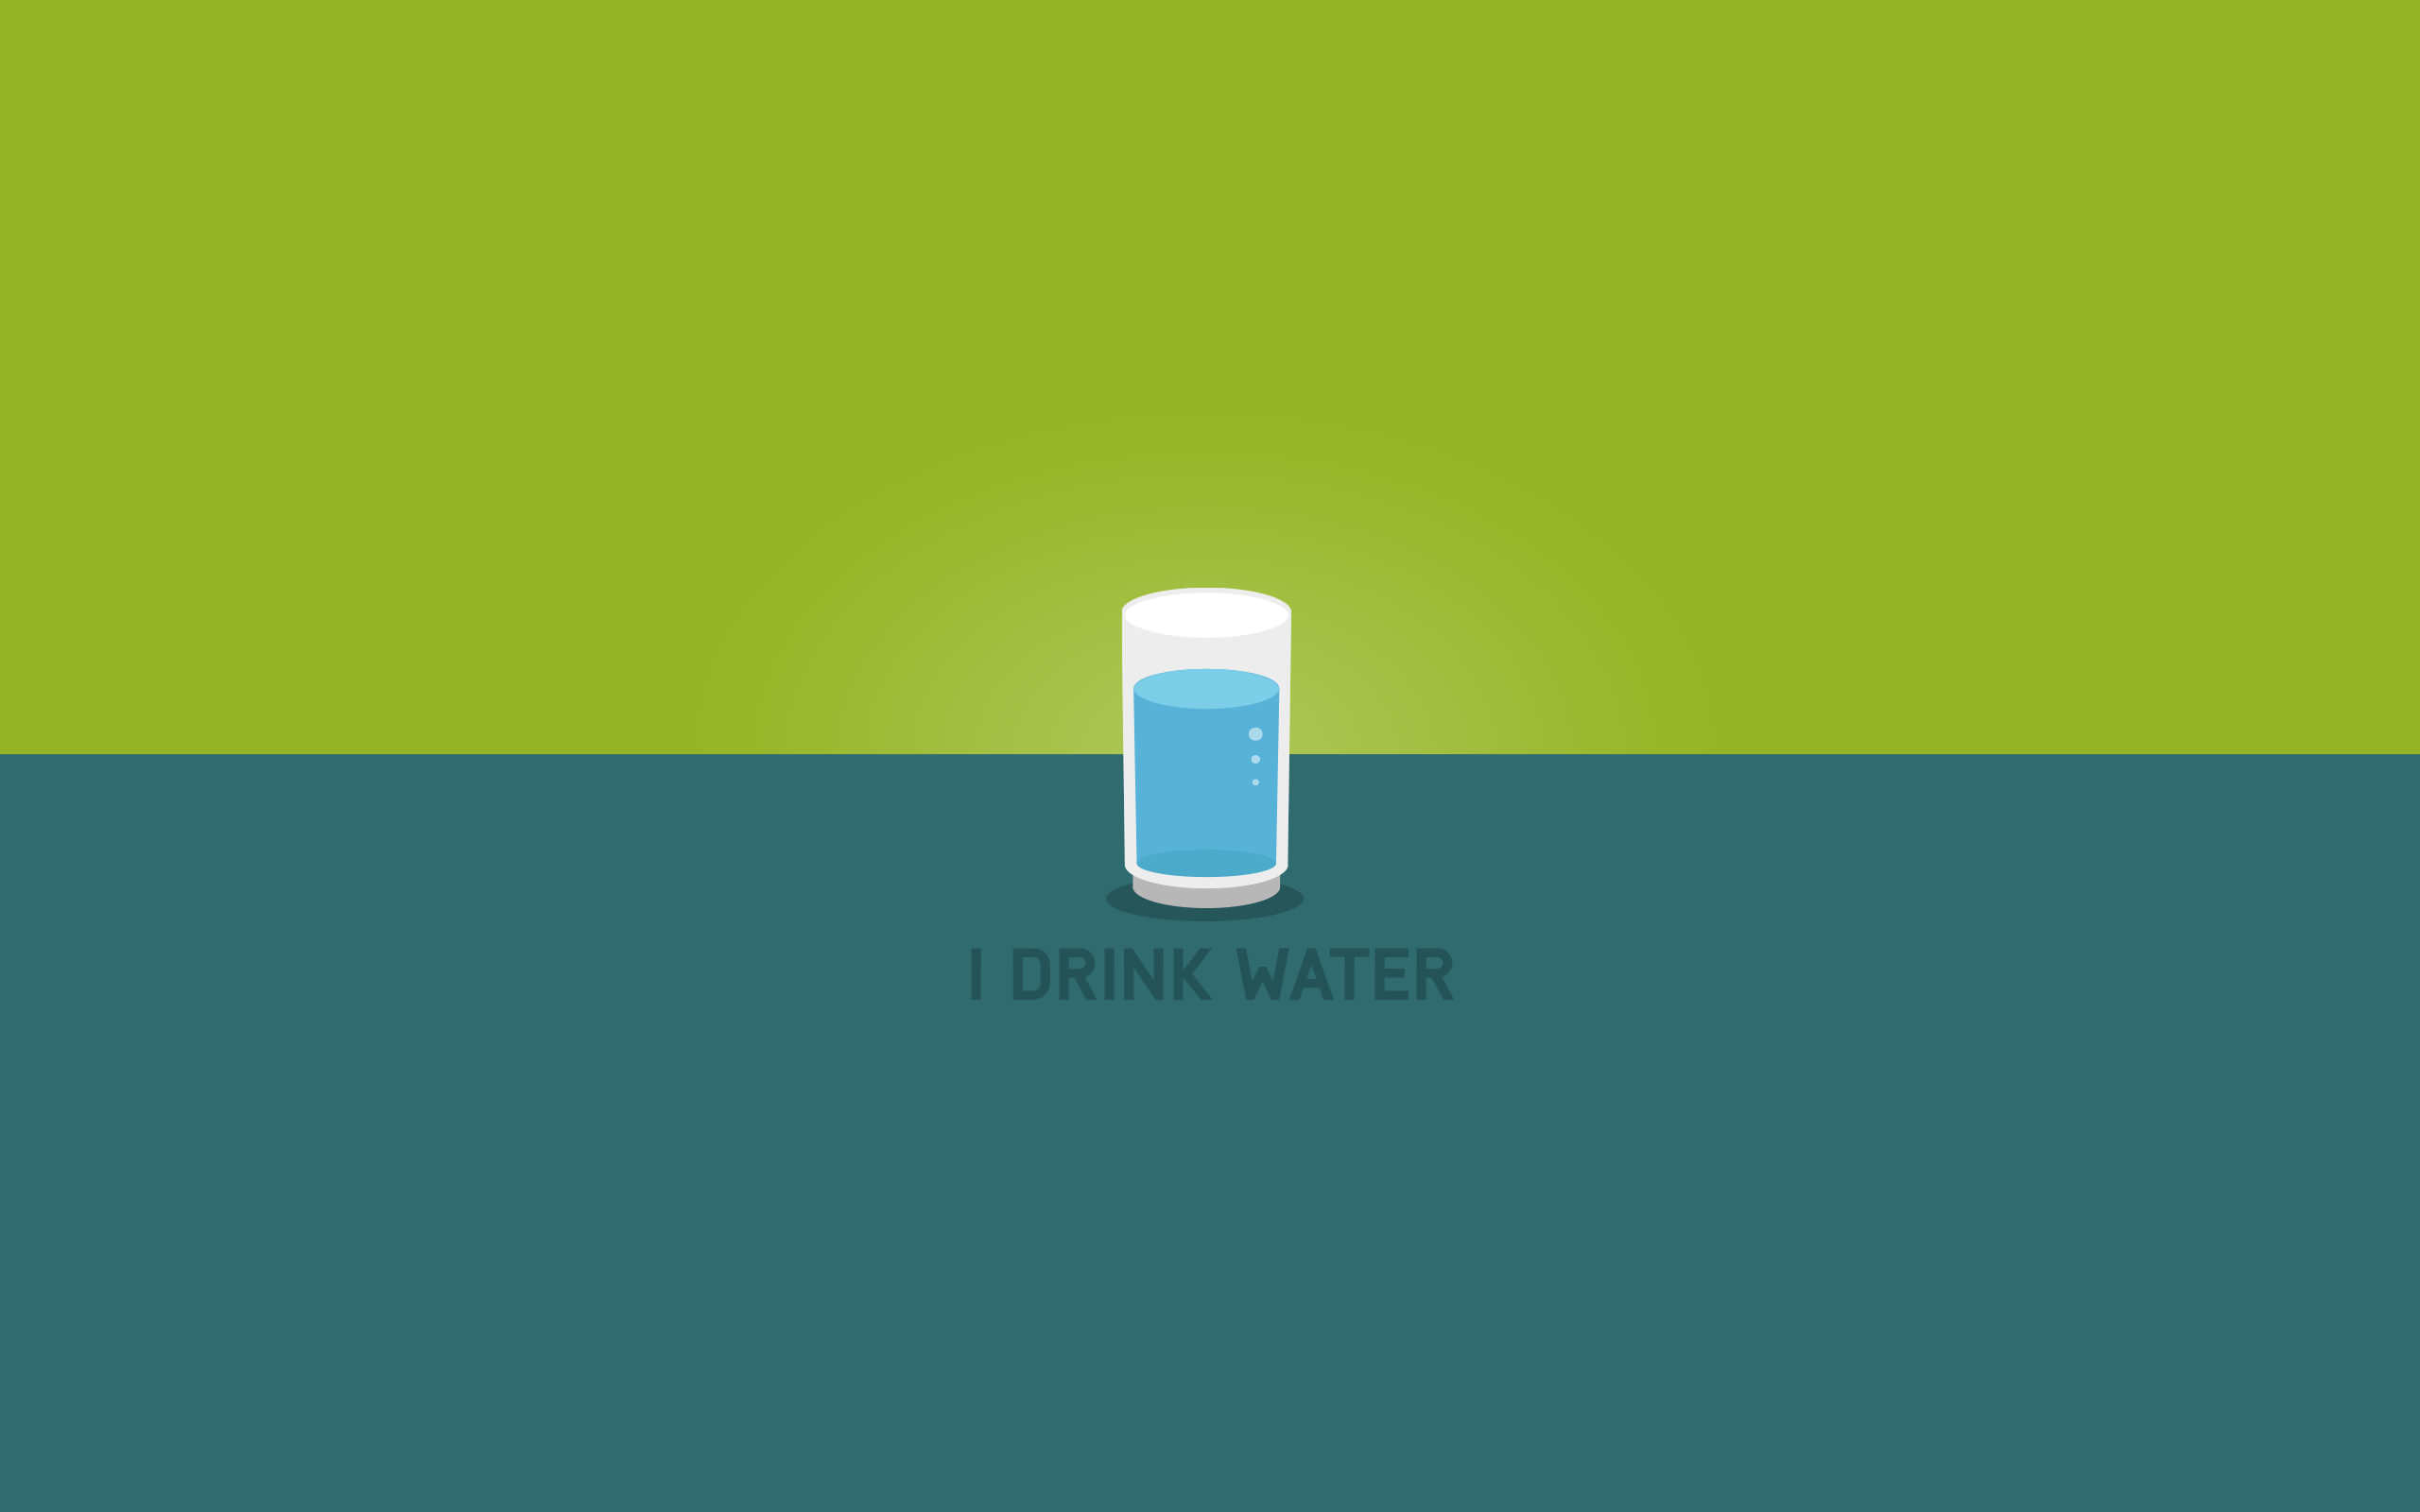 Health Wallpaper   Water Wallpaper Minimal   2560x1600 Wallpaper 2560x1600